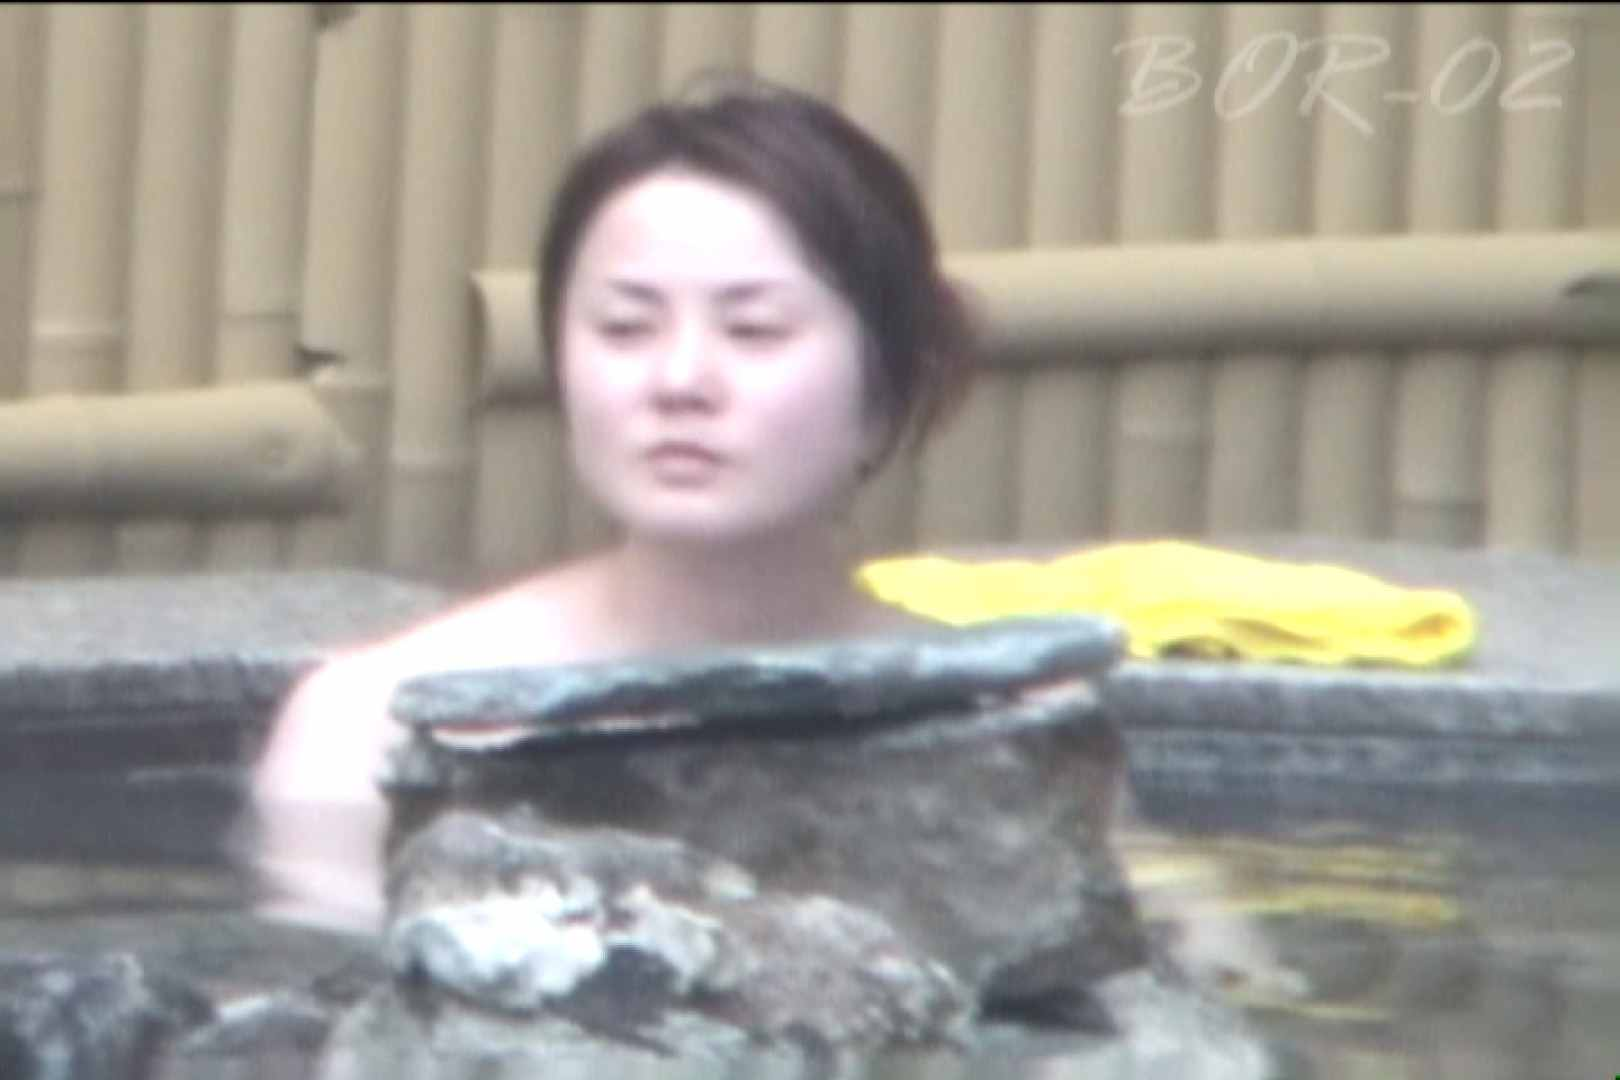 Aquaな露天風呂Vol.474 盗撮  31連発 1